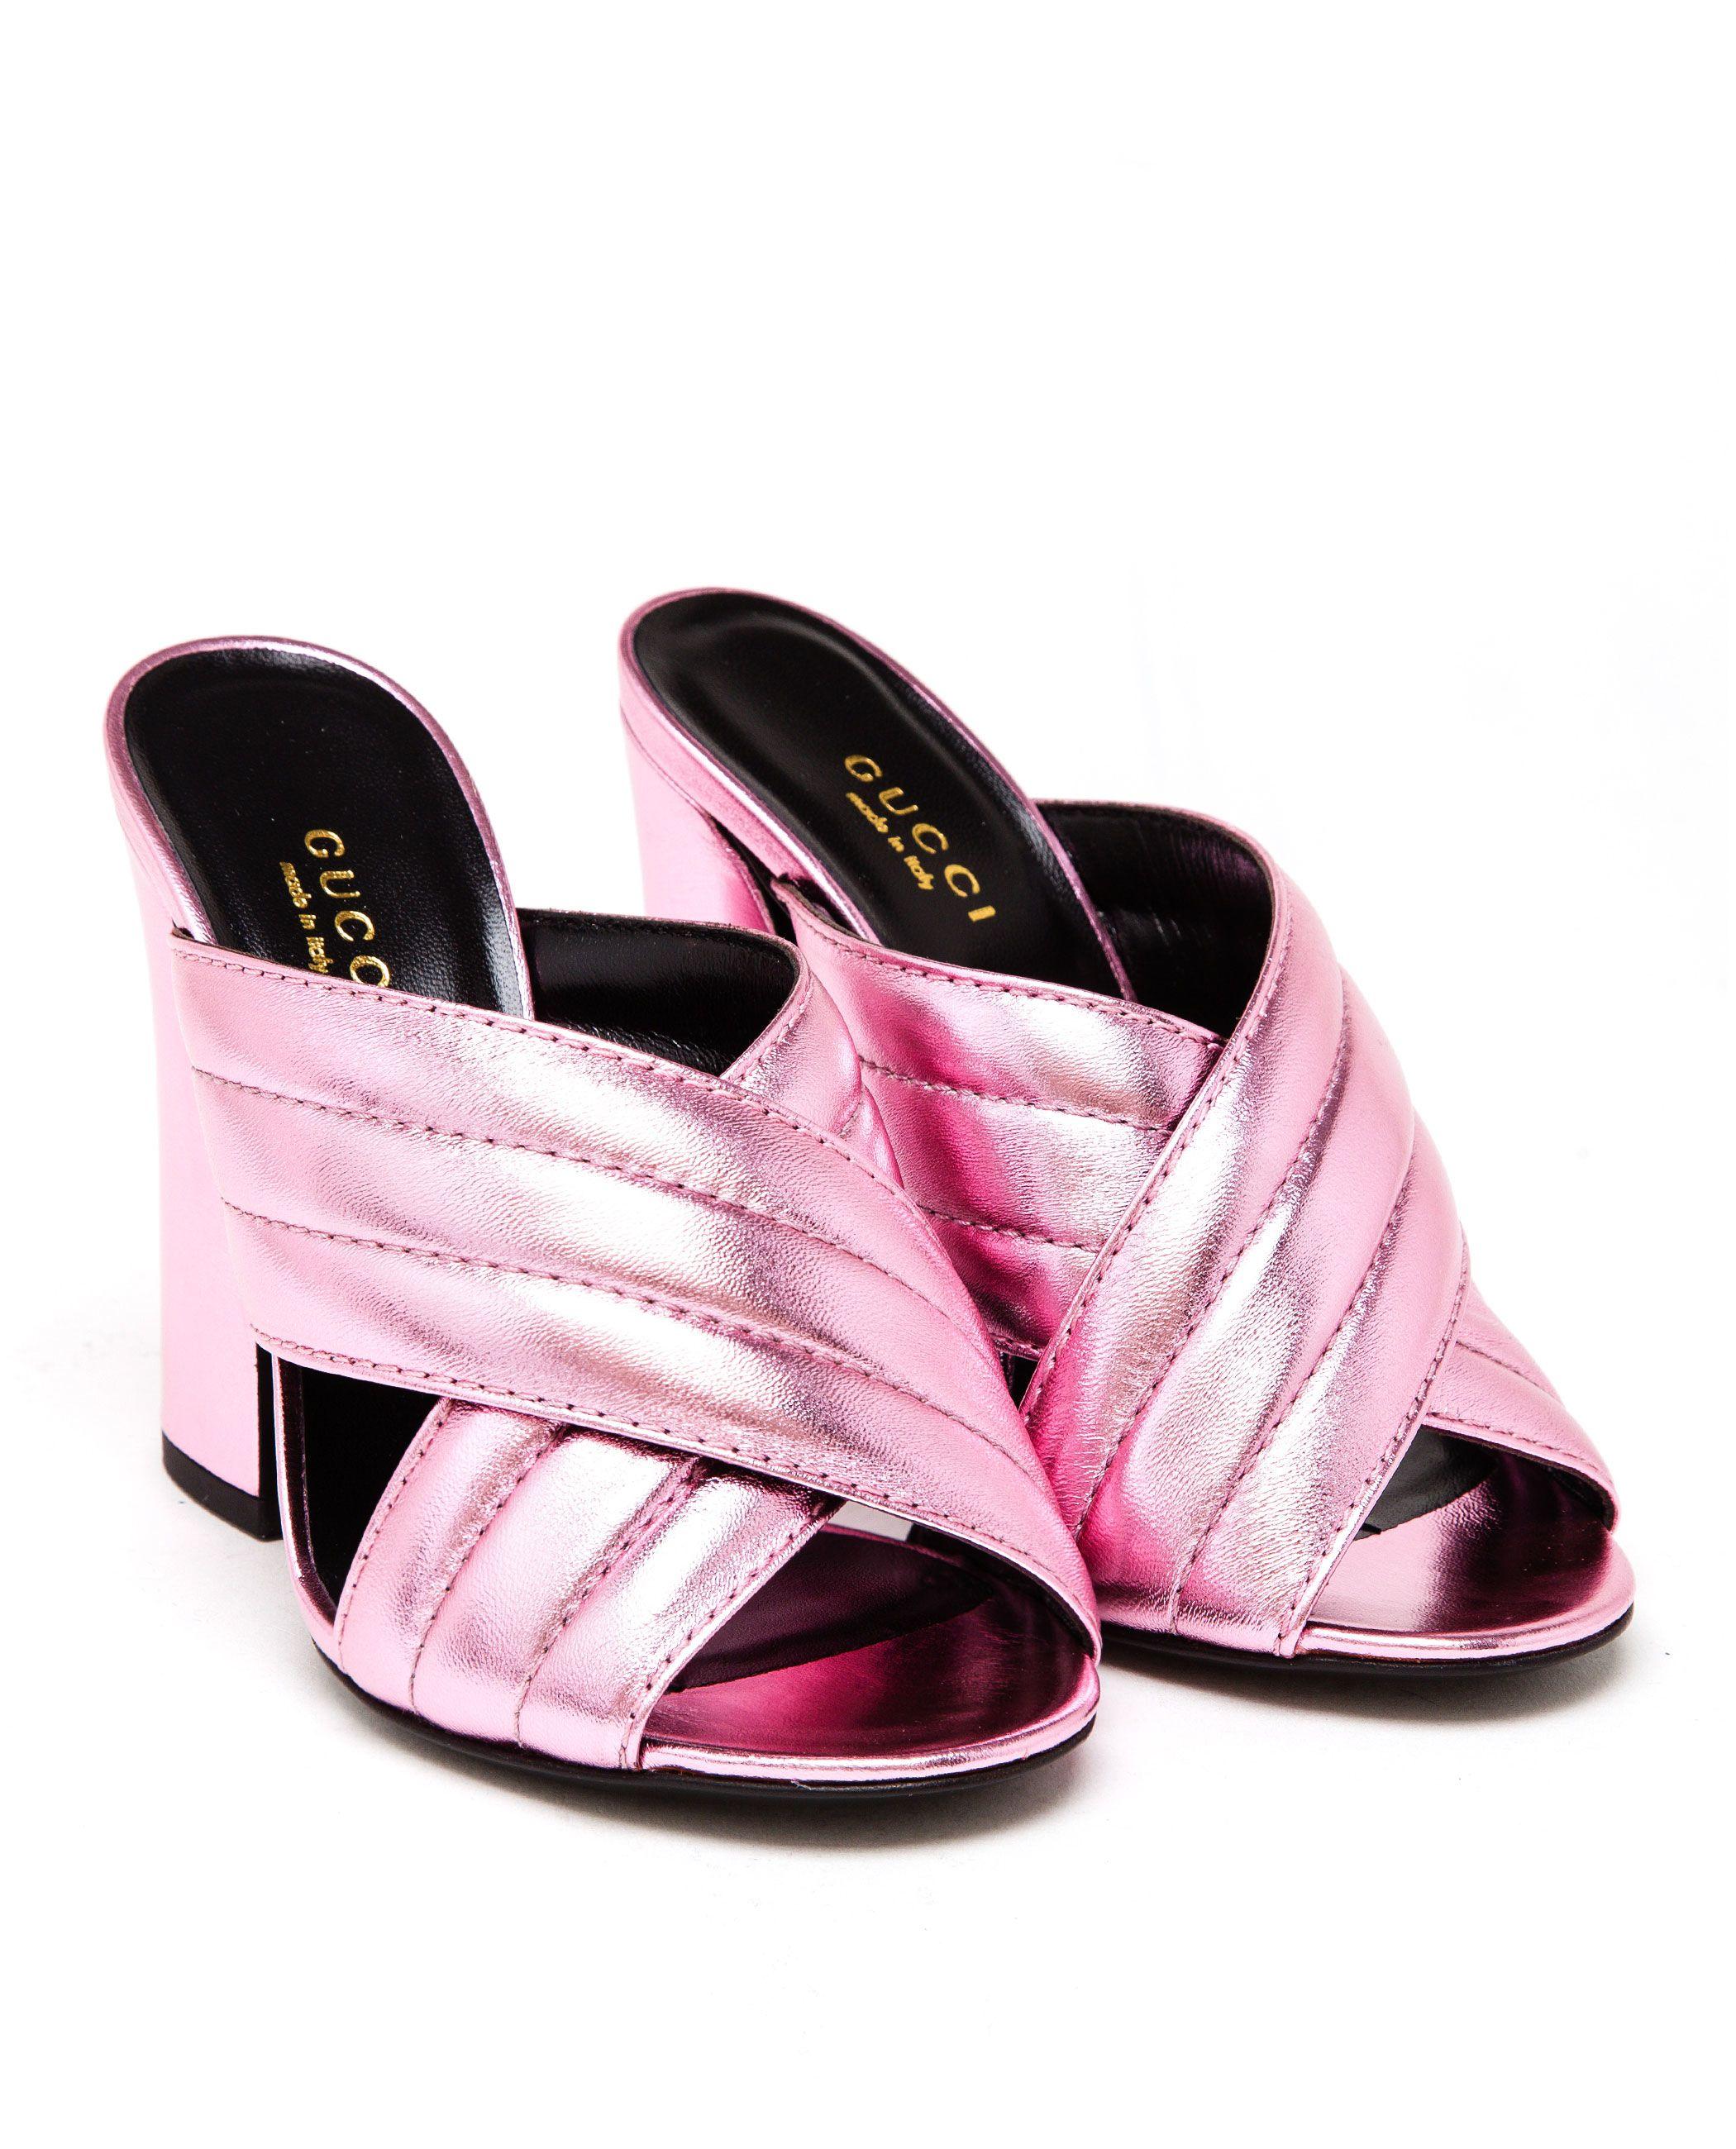 cc4cb14b3 Women s Pink Padded Metallic Leather Mules